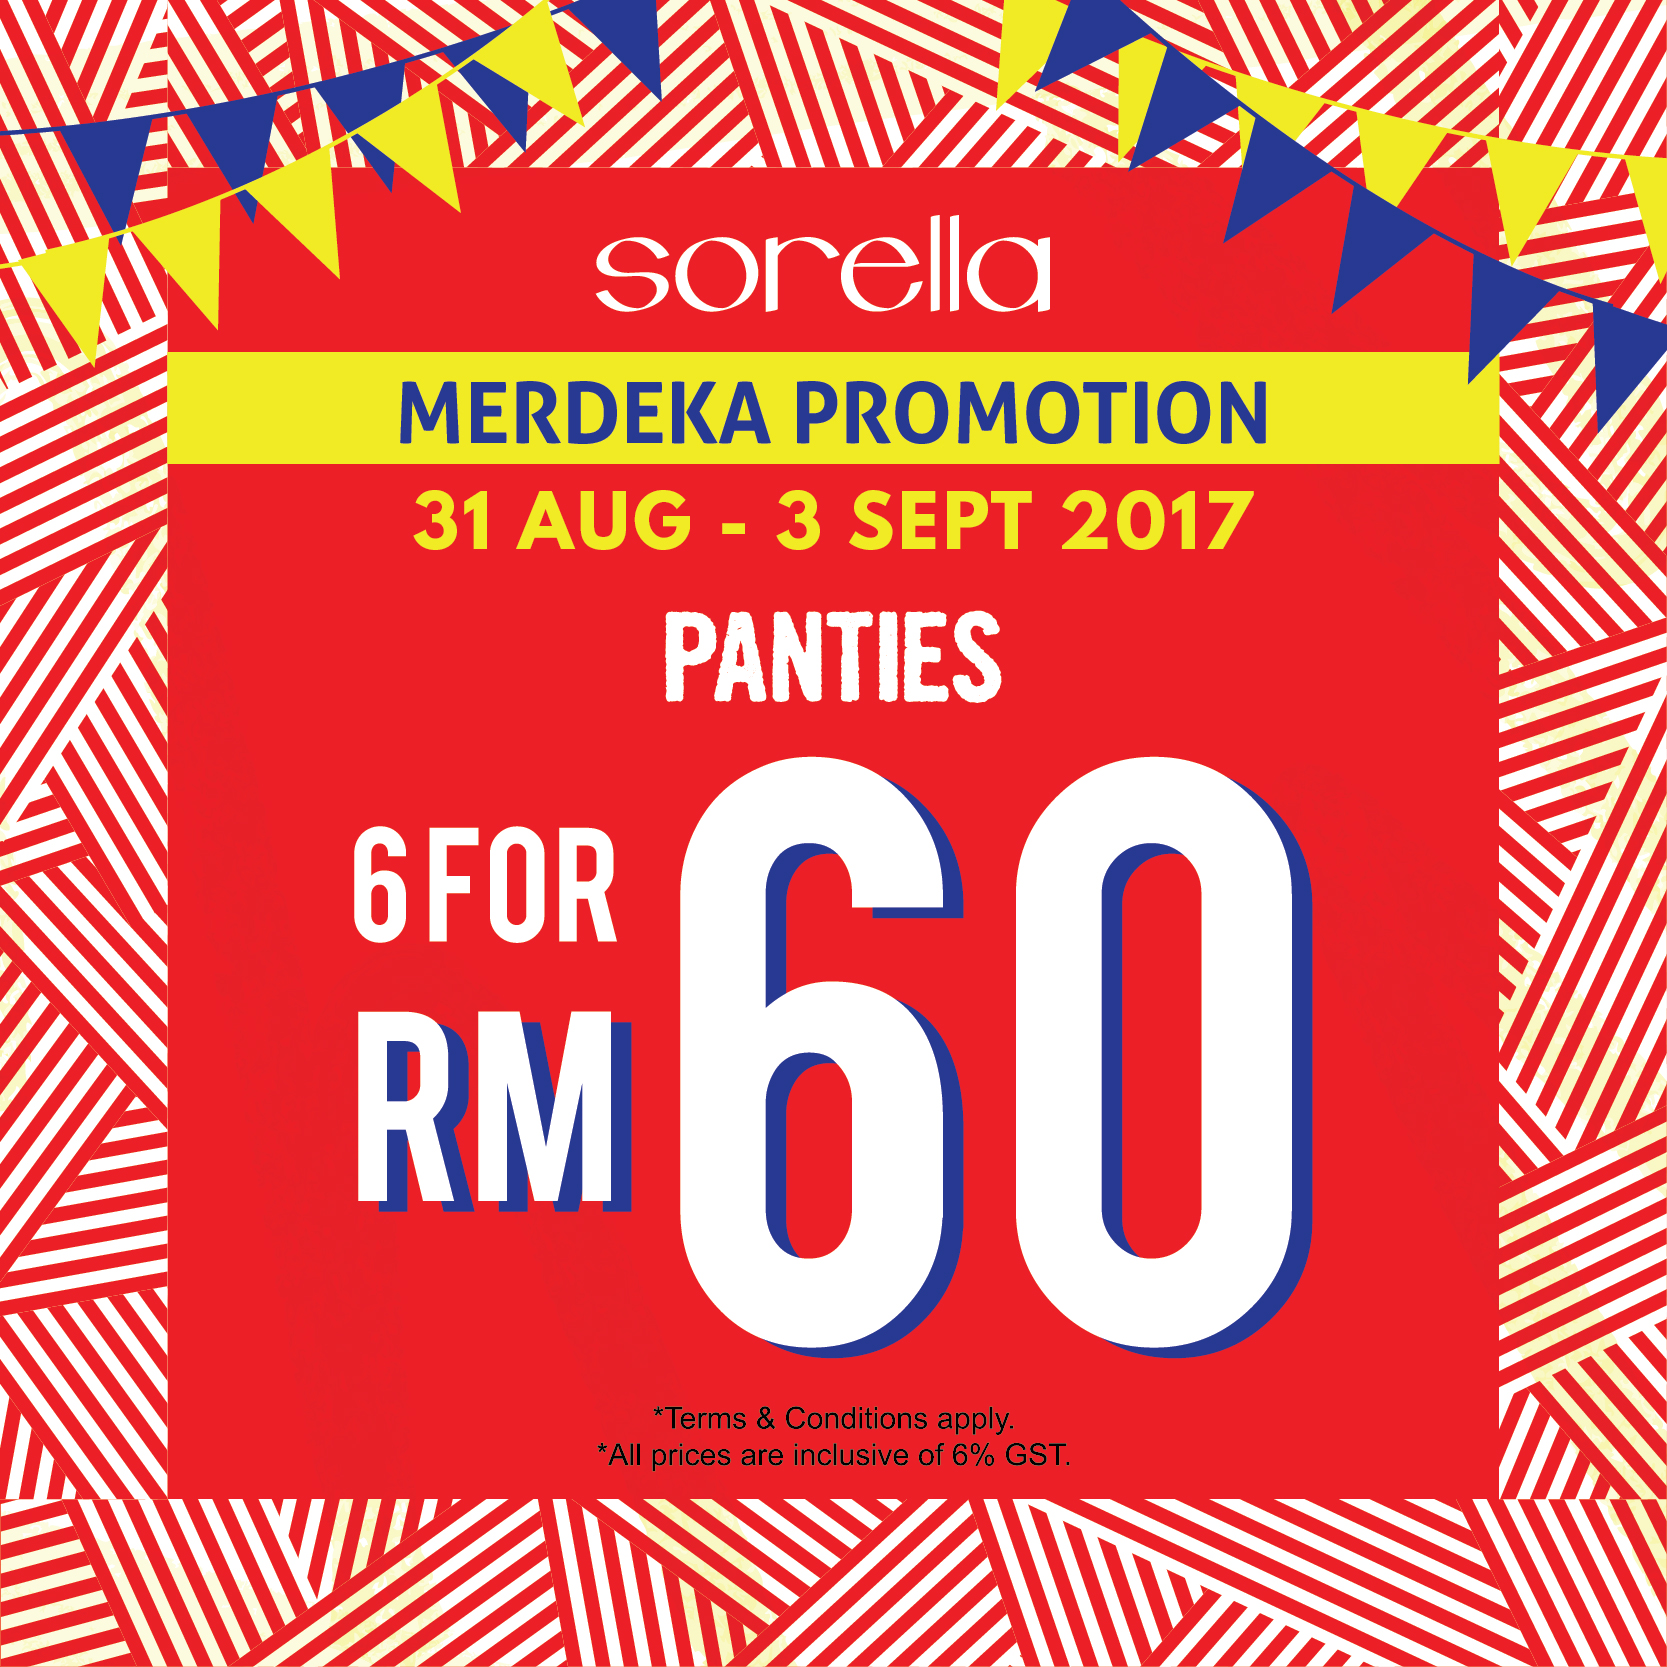 Sorella Merdeka Promotion